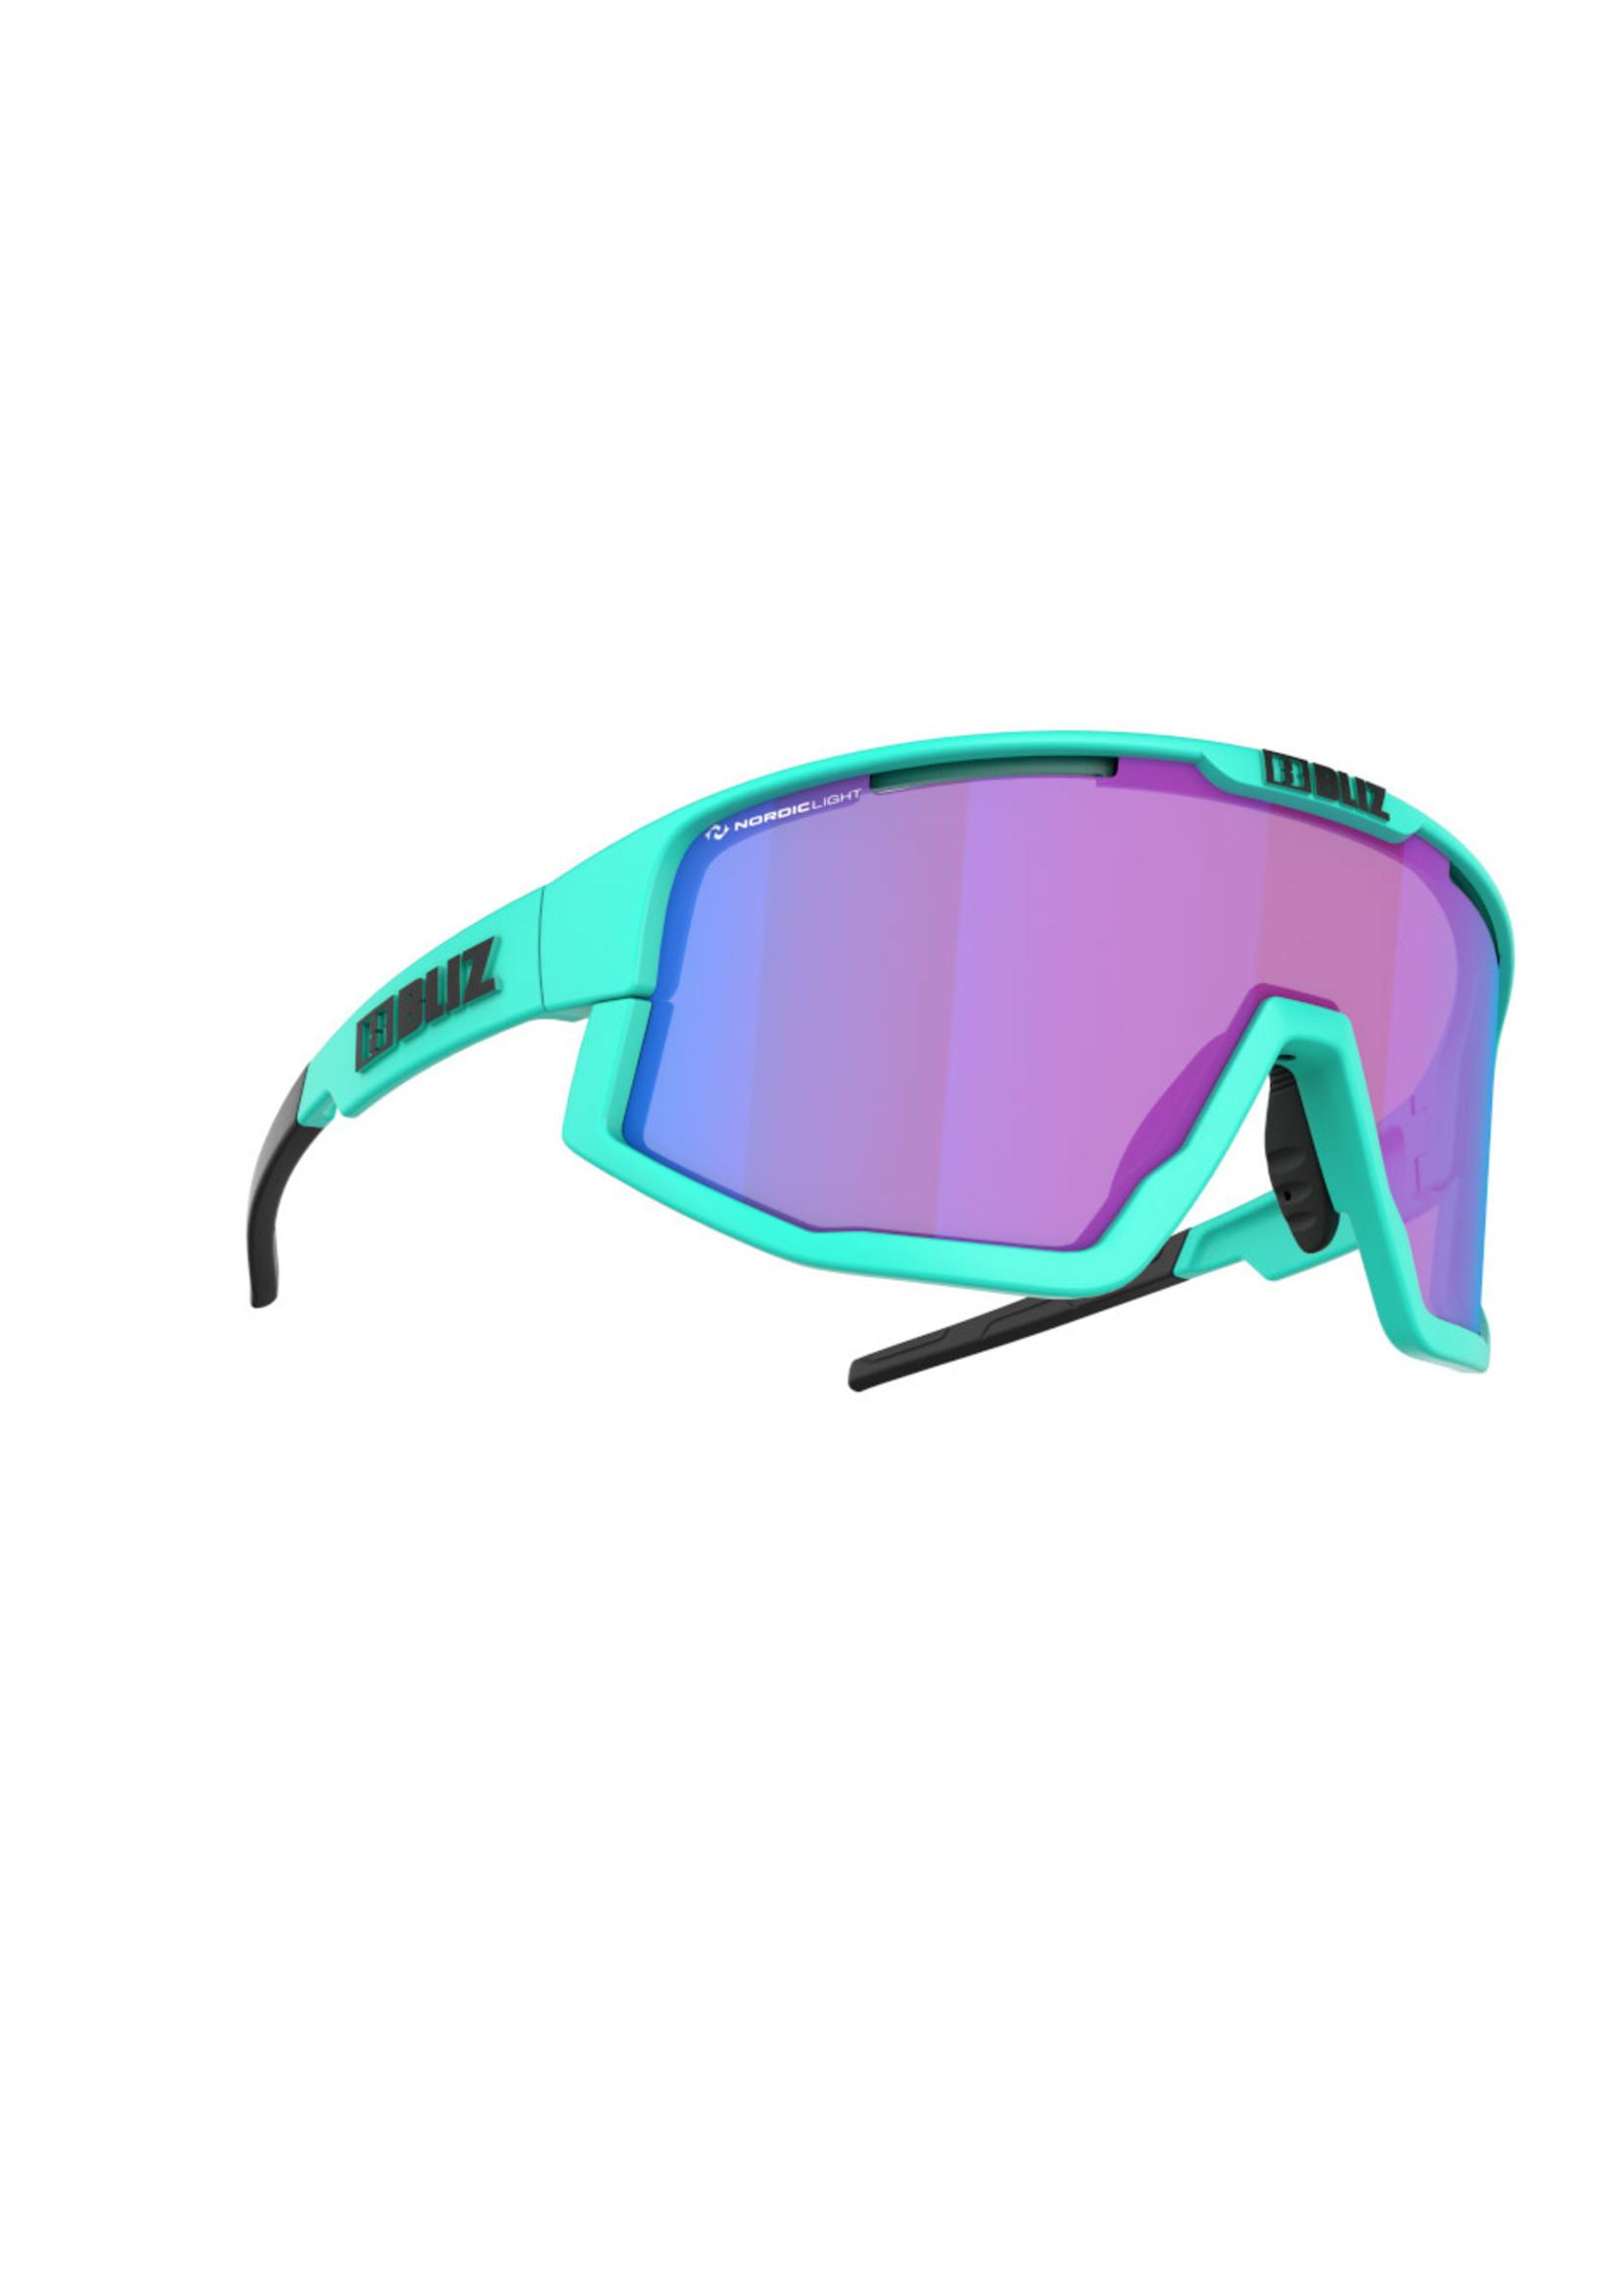 Bliz Eyewear Bliz Fusion lunettes